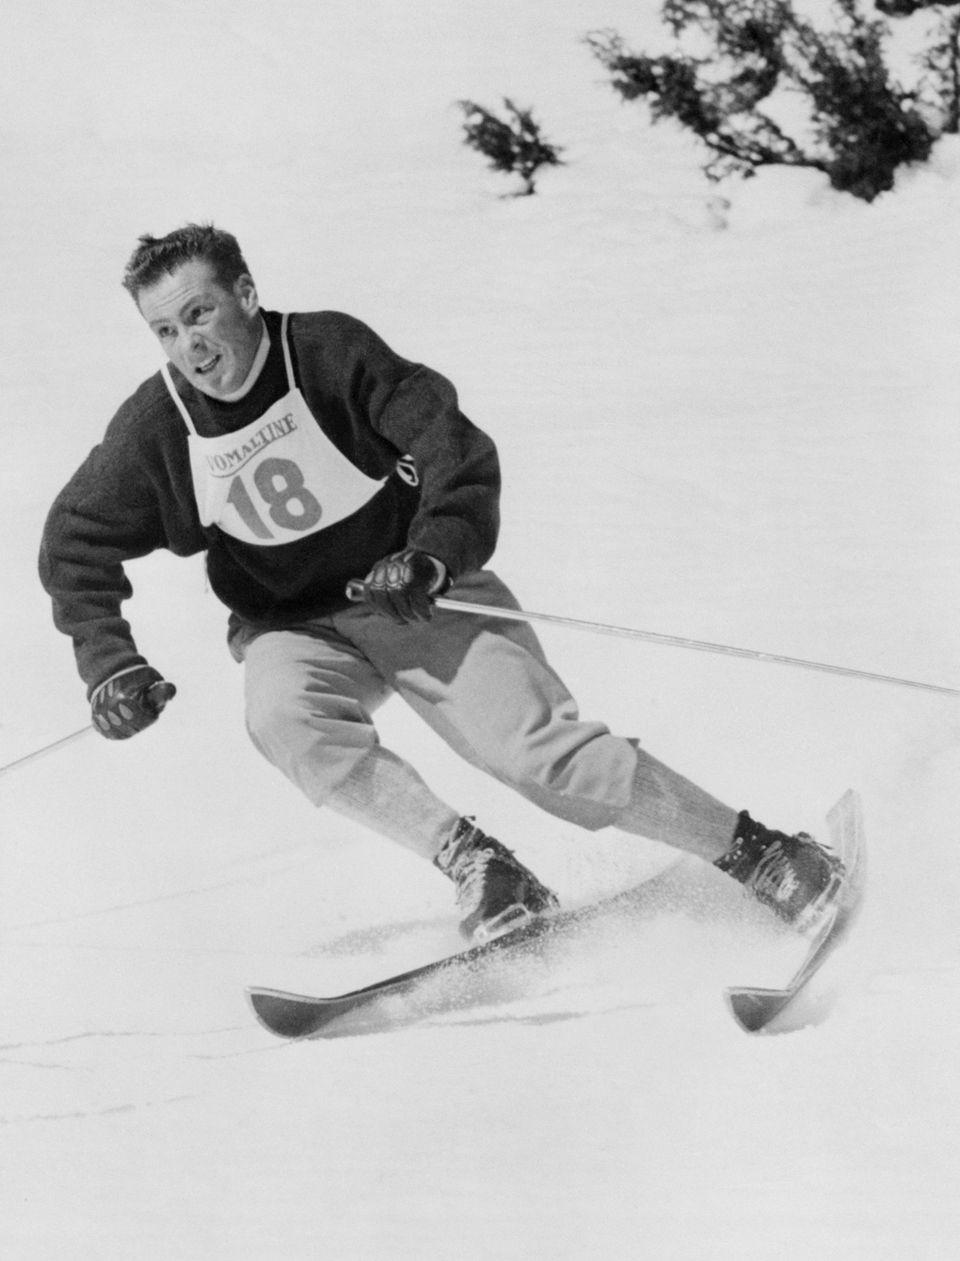 Olympic skiing champion Jean Vuarnet, who helped pioneer